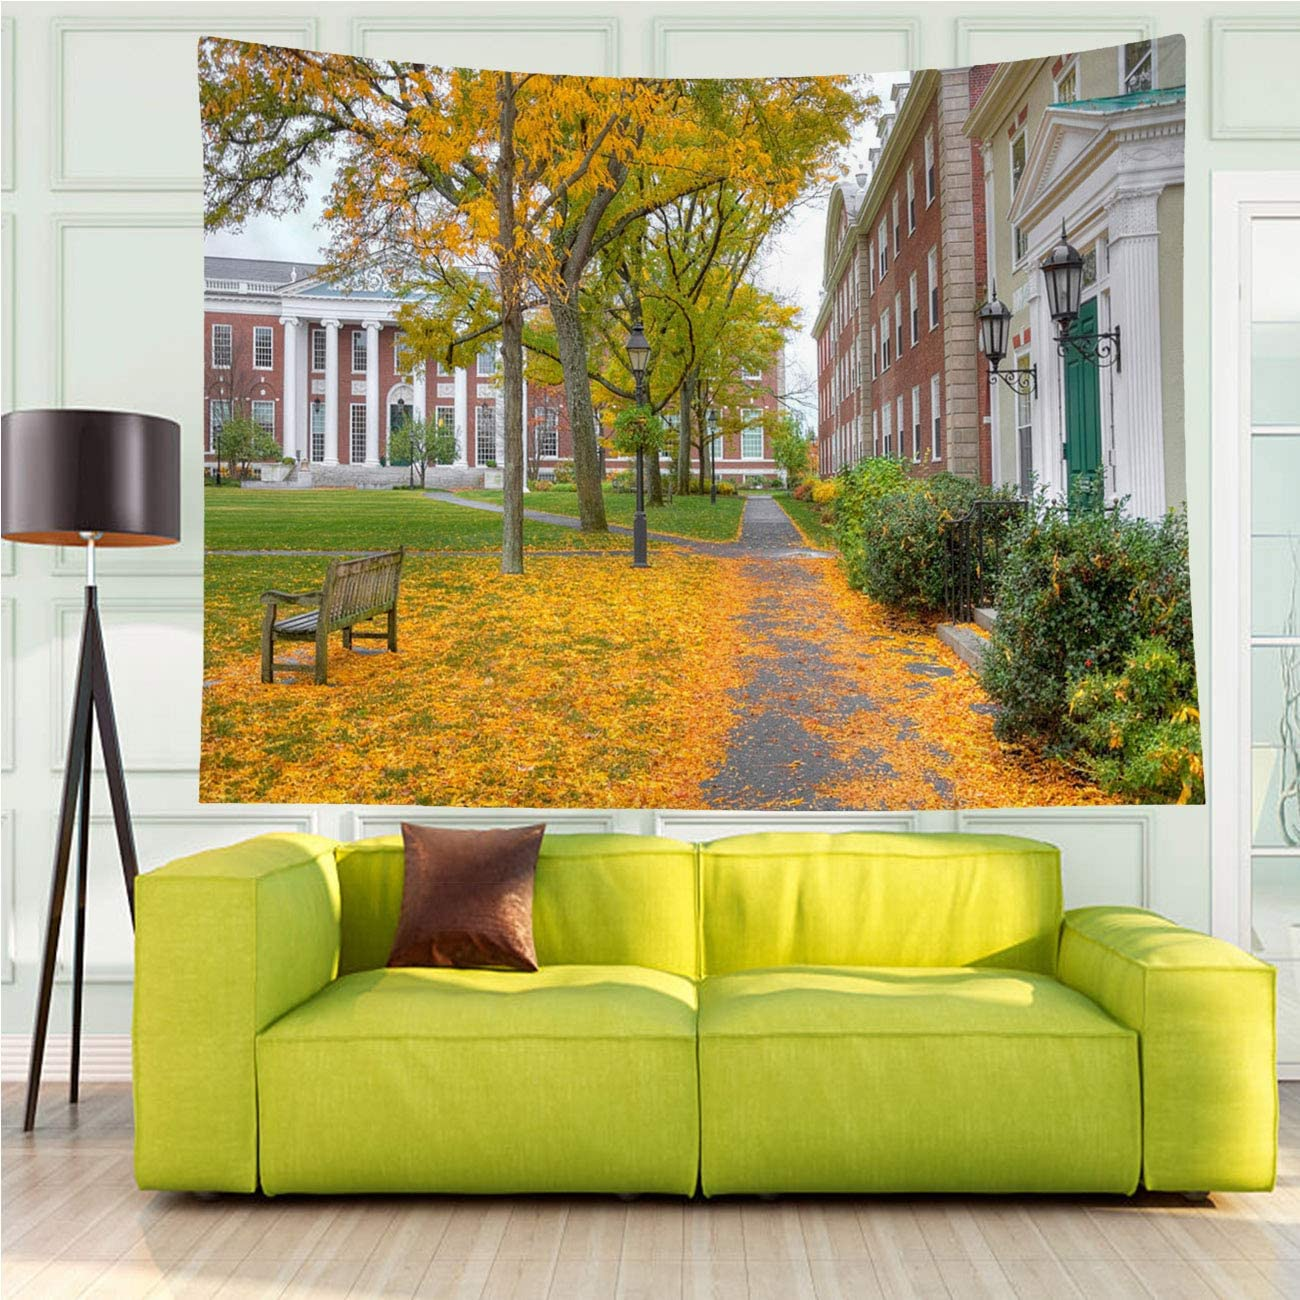 MinGz Landscape Tapestry Wall Hanging Versatile,Harvard University,Tapestry for Living Room Bedroom Dorm Home Decor,70x50 in